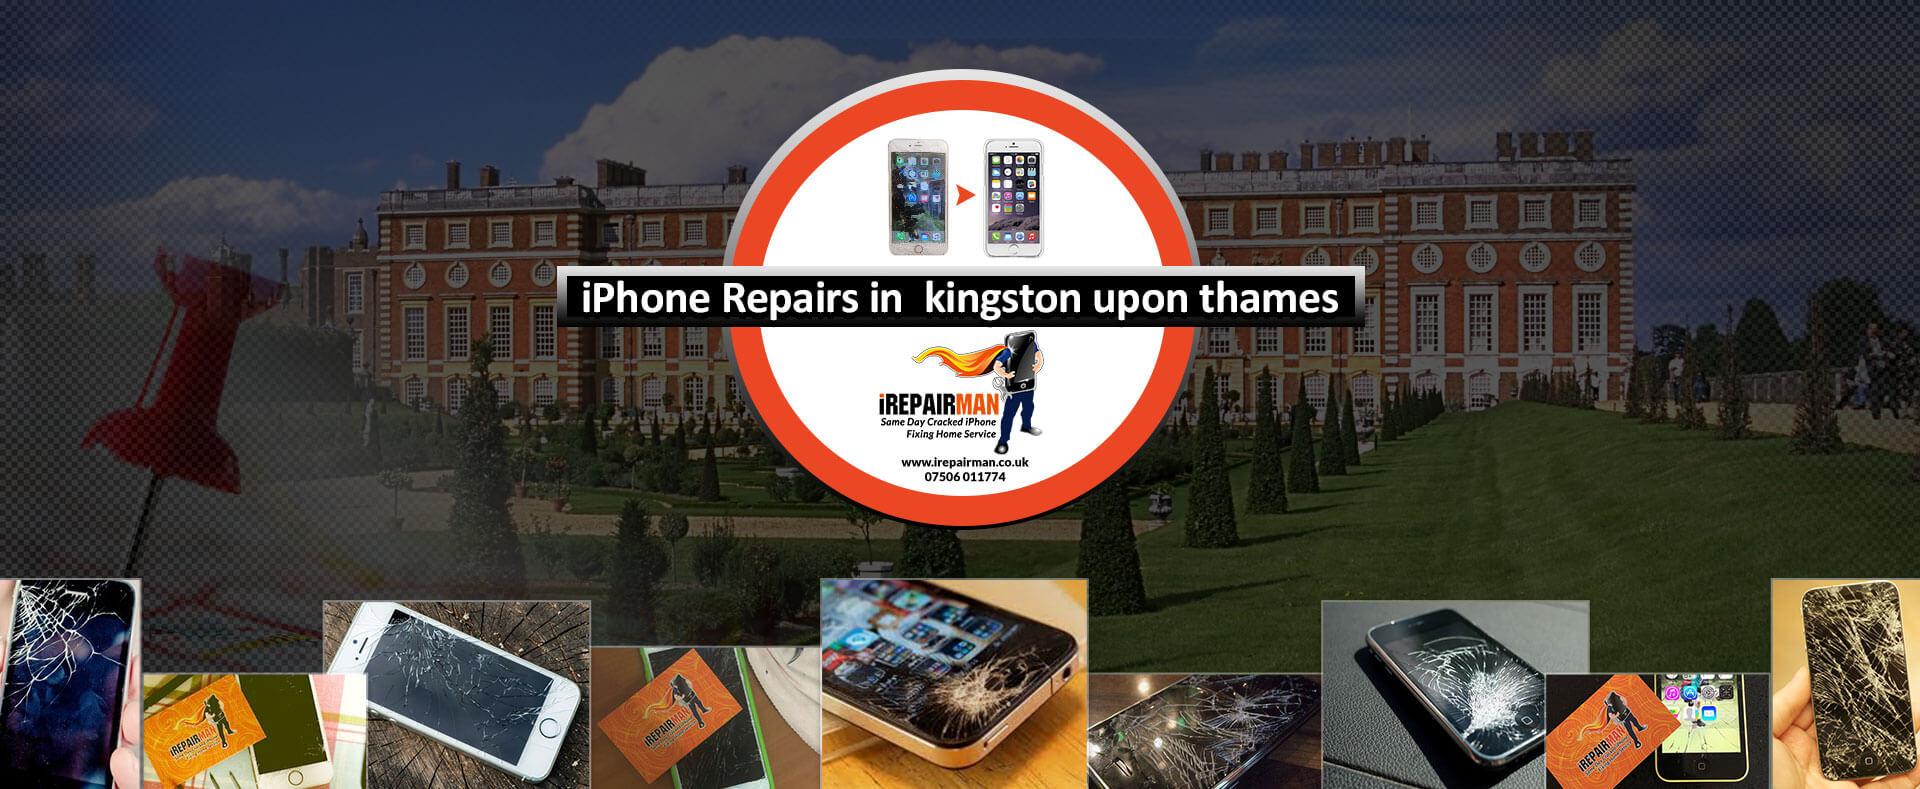 iphone-repairs-in-kingston-upon-thames